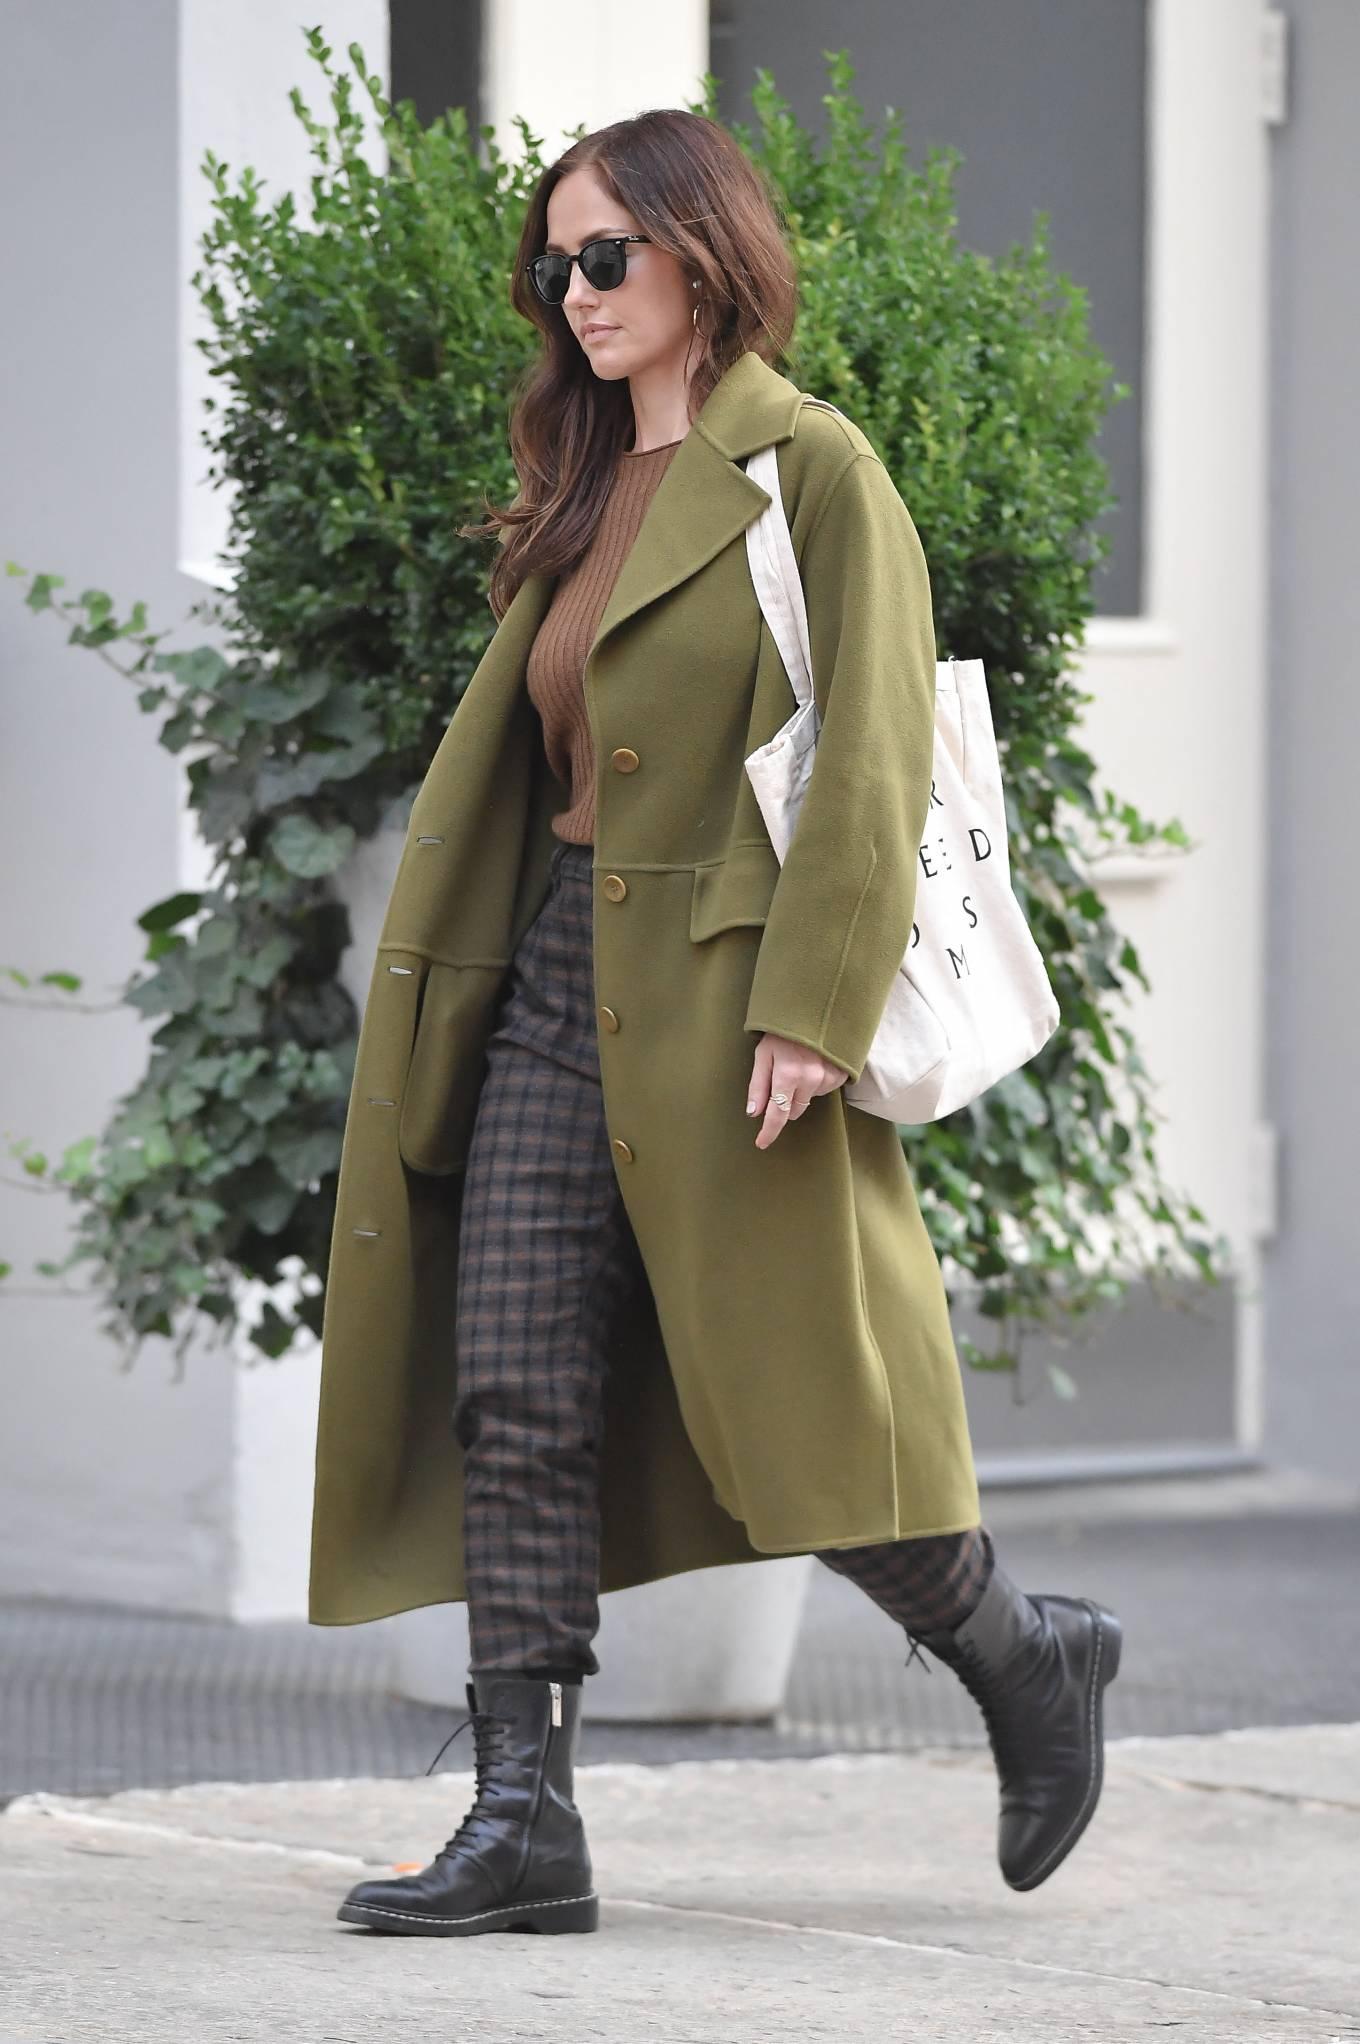 Minka Kelly 2021 : Minka Kelly – In olive green runs errands in New York-06